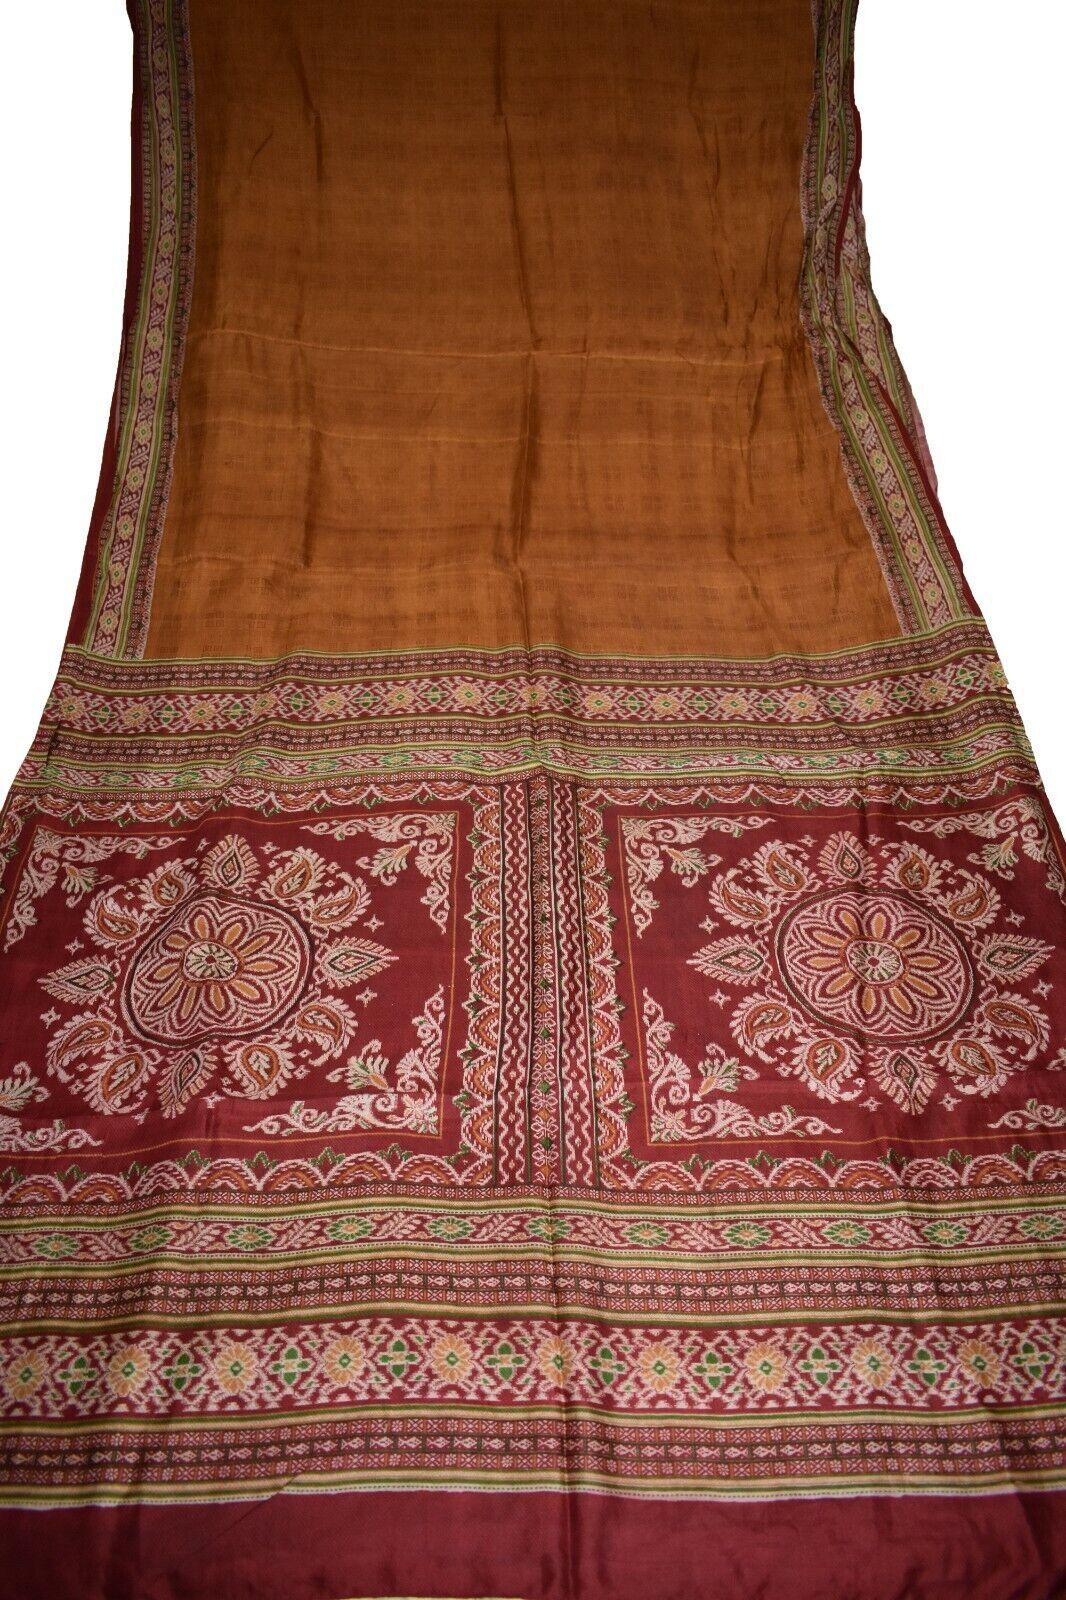 Vintage Printed Sari Brown Pure Silk Abstract Print 5Yrd Saree Design Craft 5551